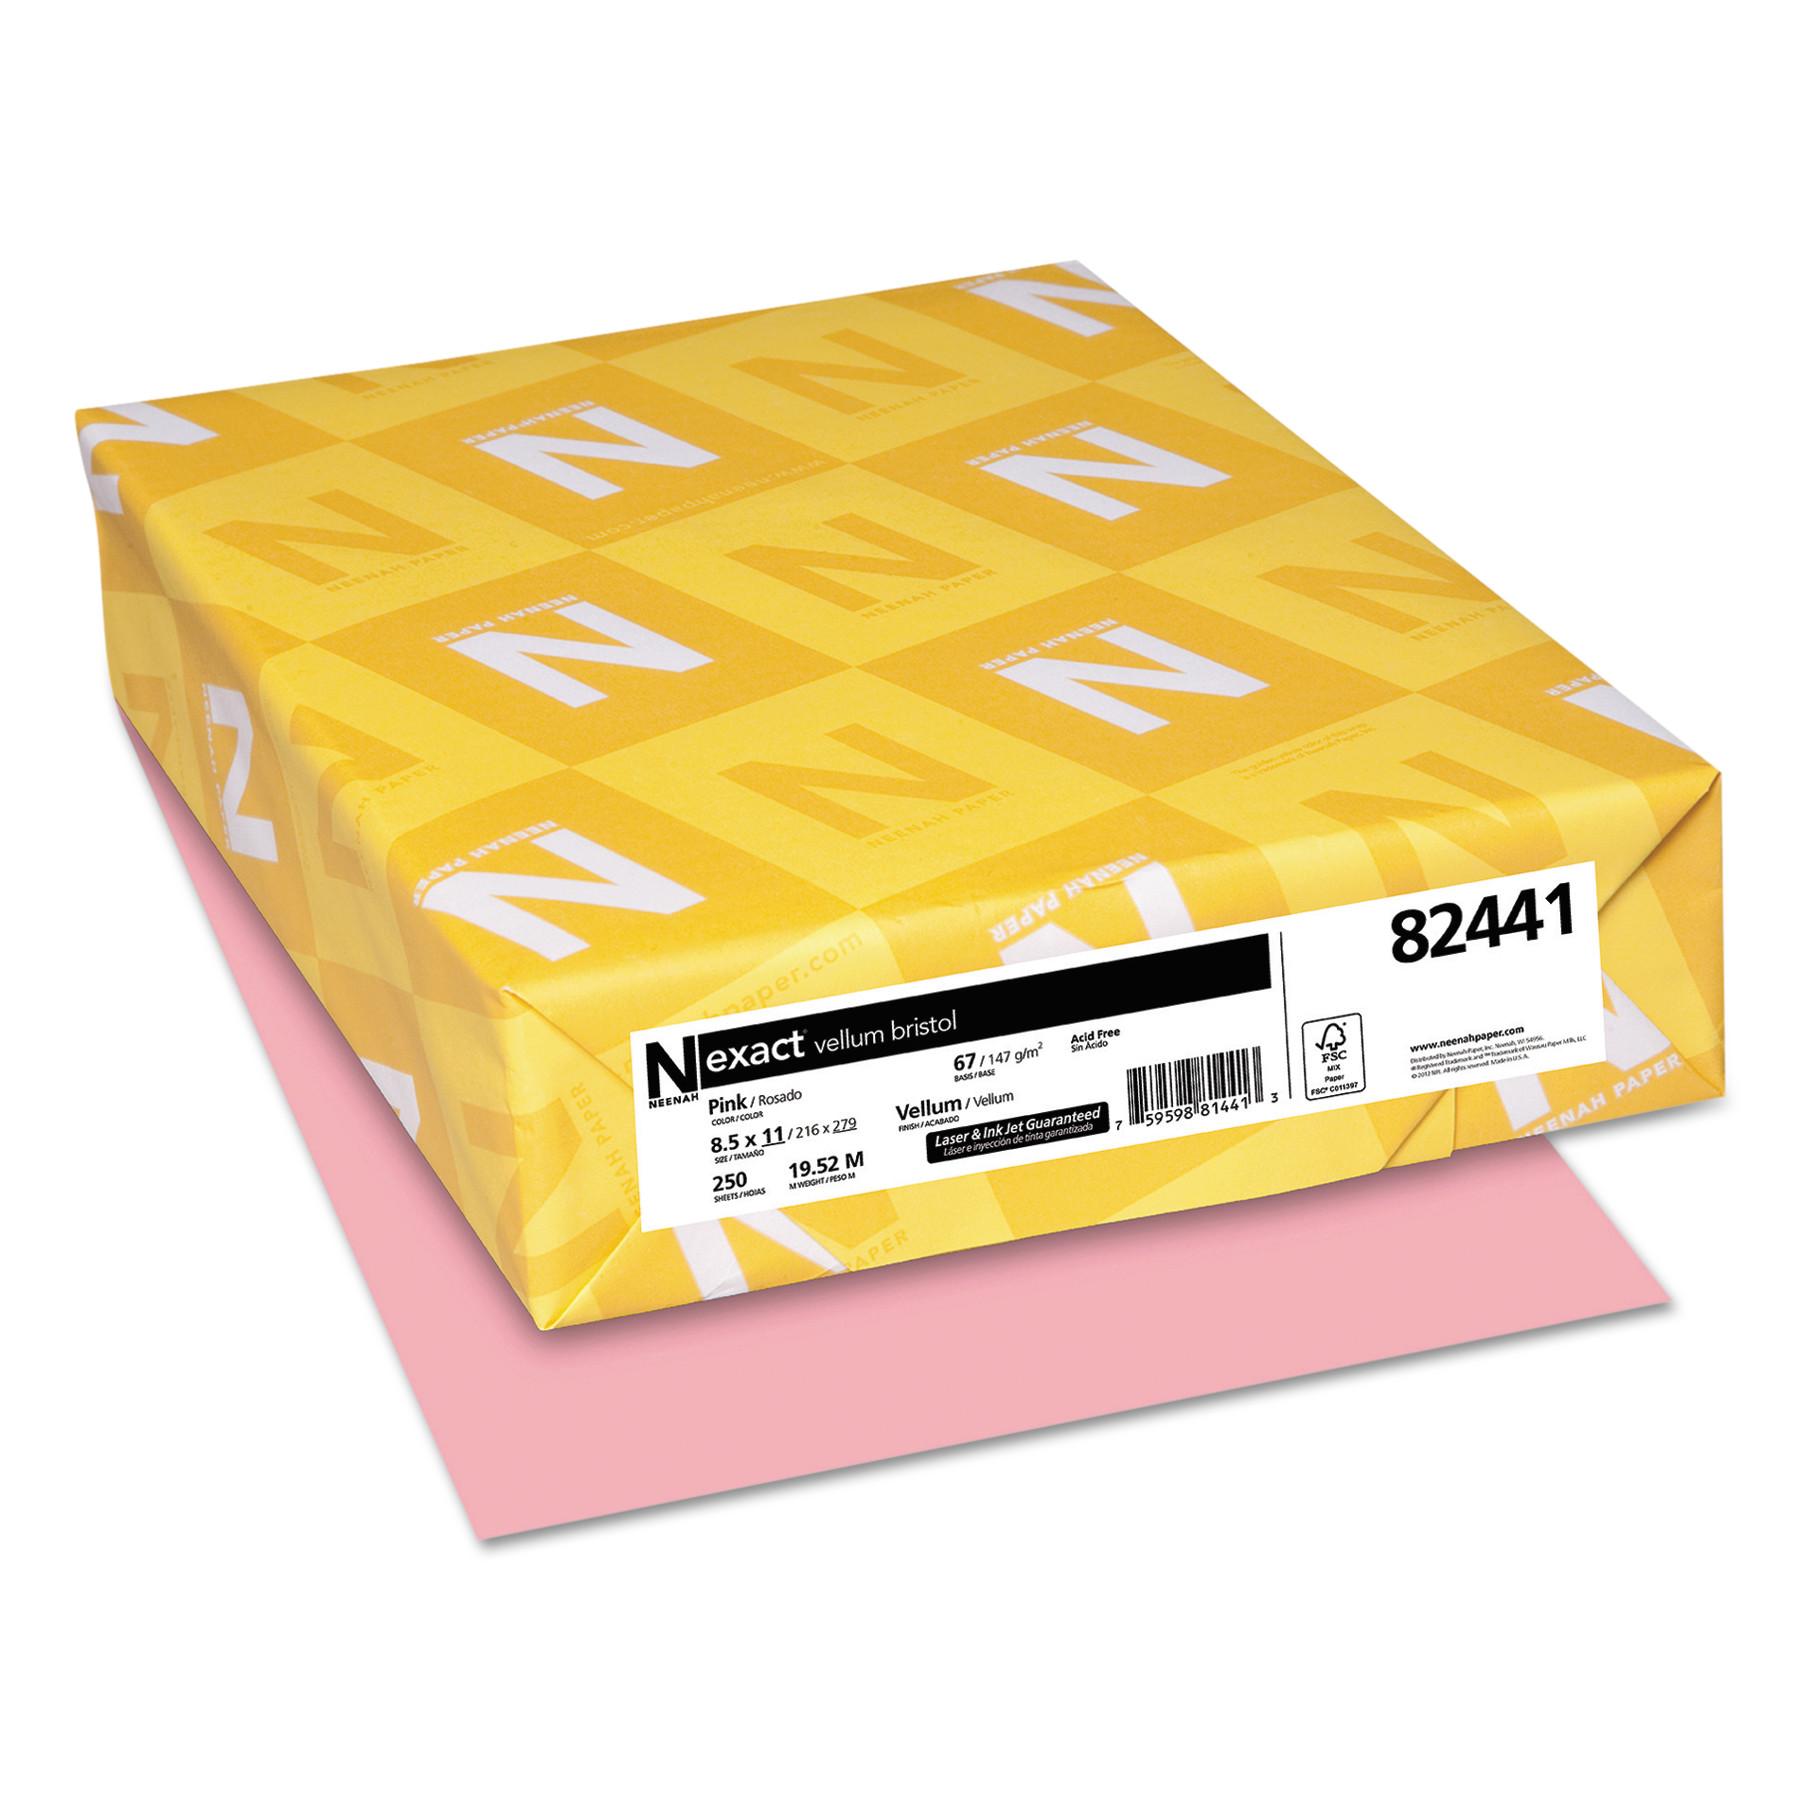 Neenah Paper Exact Vellum Bristol Cover Stock, 67lb, 8 1/2 x 11, Pink, 250 Sheets -WAU82441